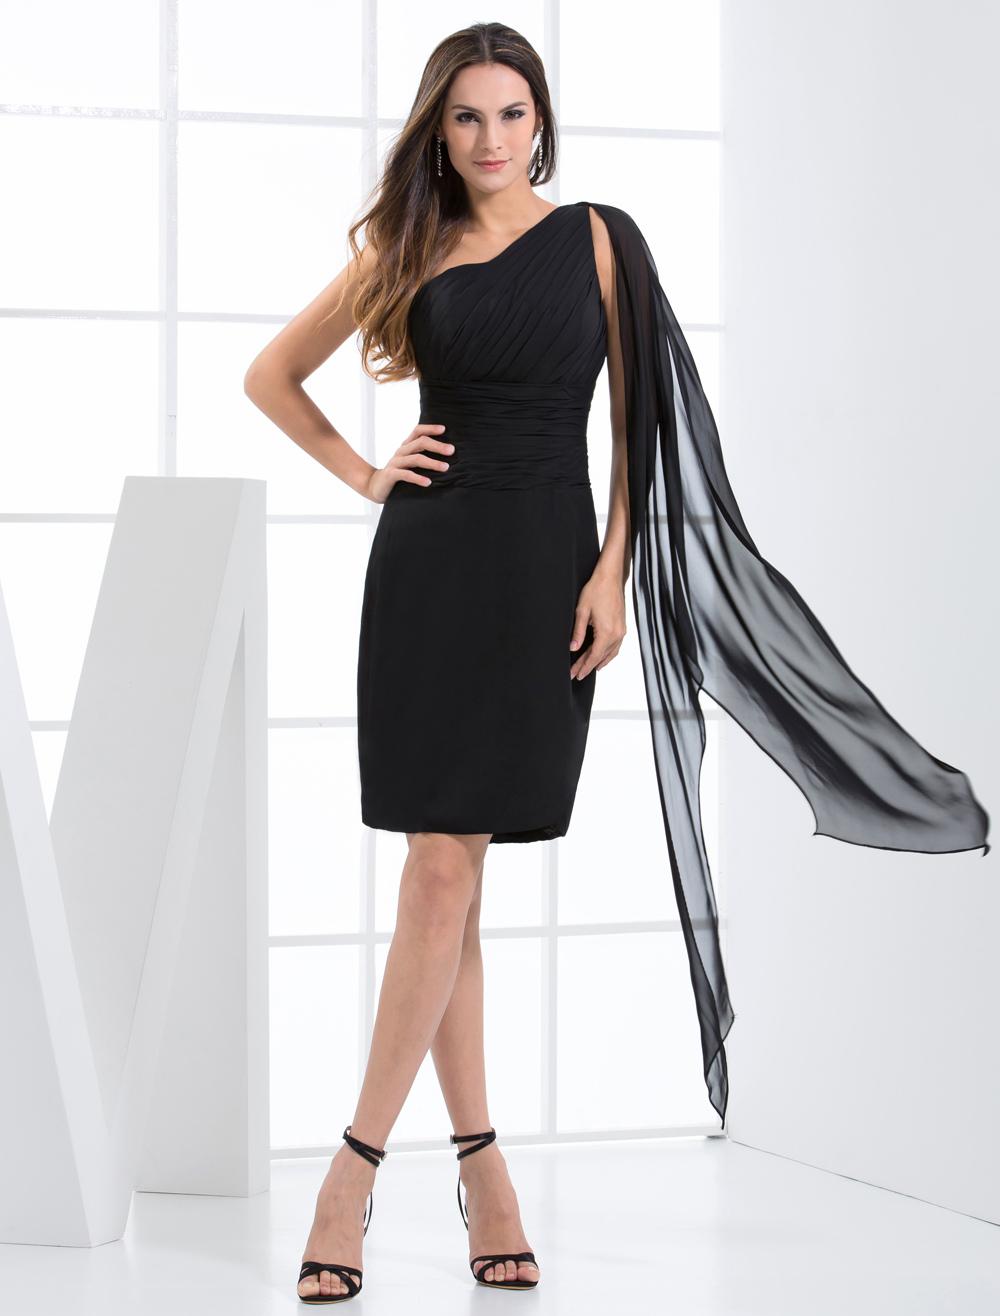 Black One-Shoulder Chiffon Cocktail Dress  Wedding Guest Dress